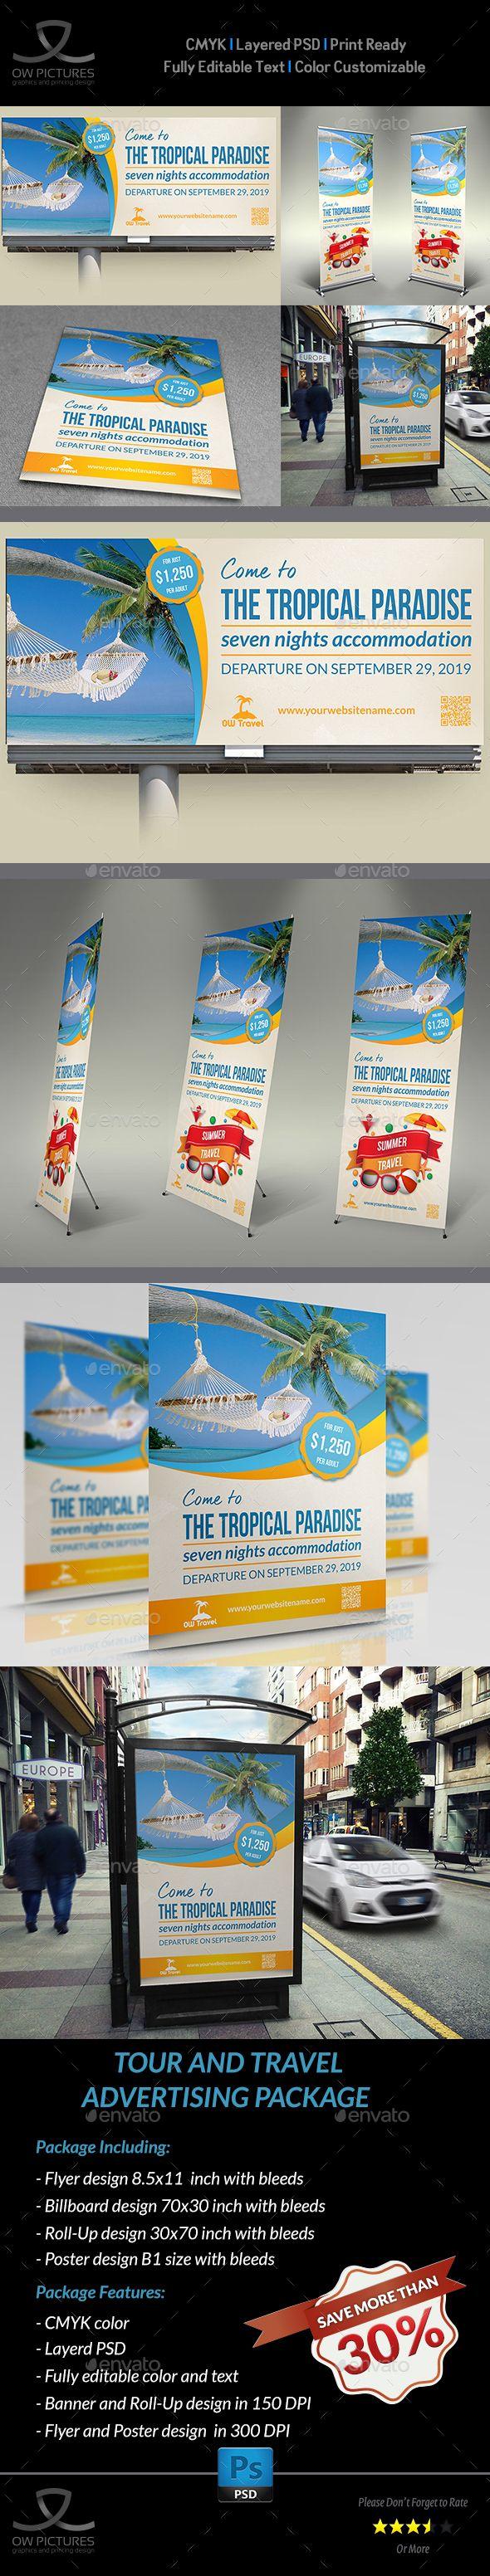 8 5x11 poster design - Tour And Travel Advertising Bundle